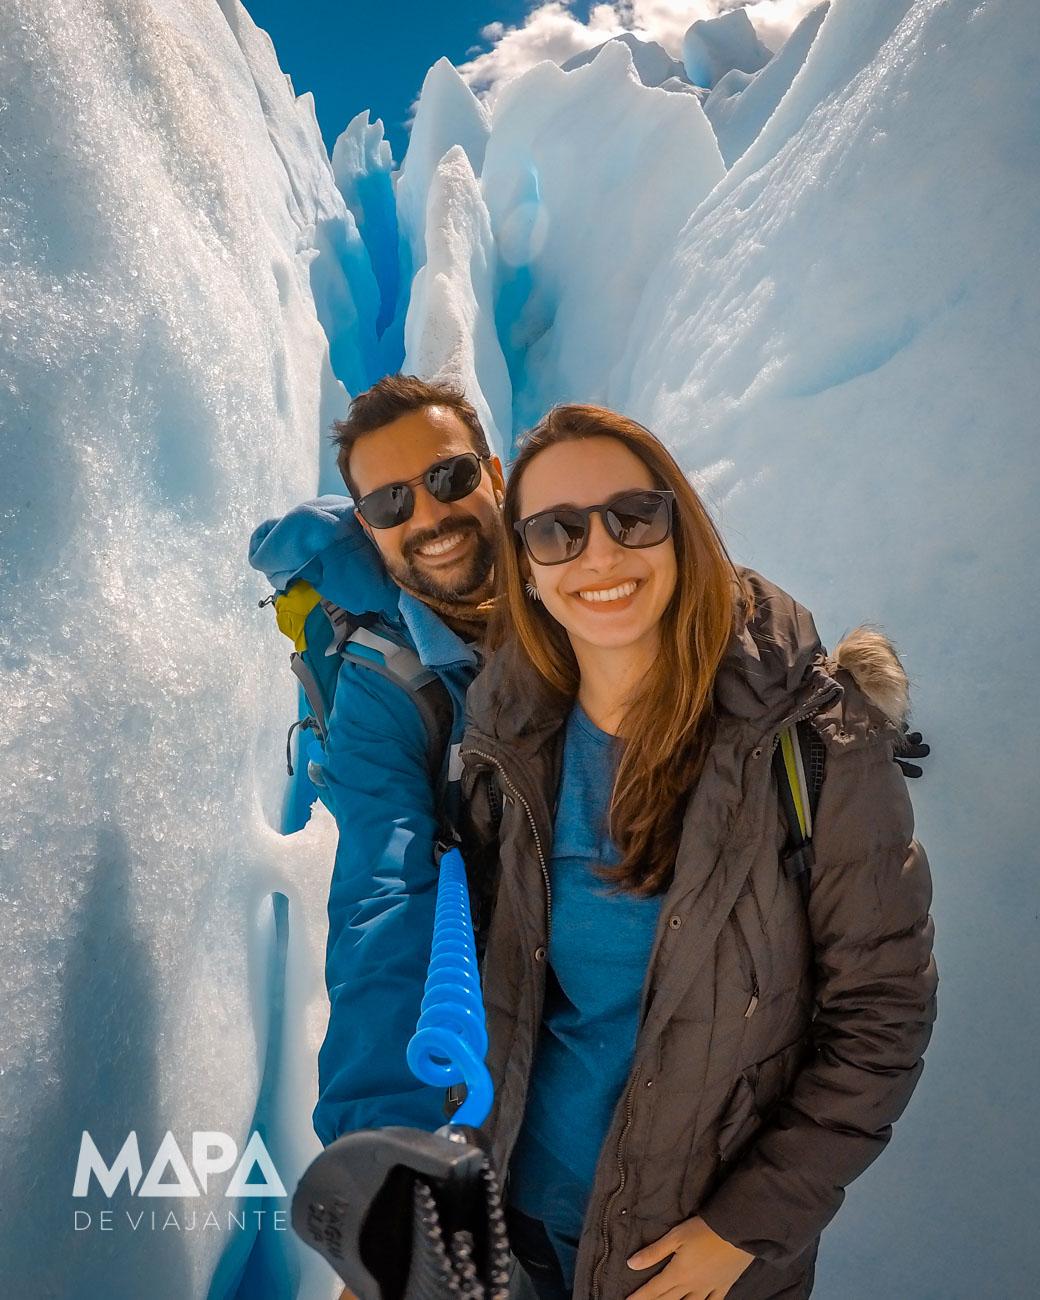 Mapa de Viajante: Perito Moreno